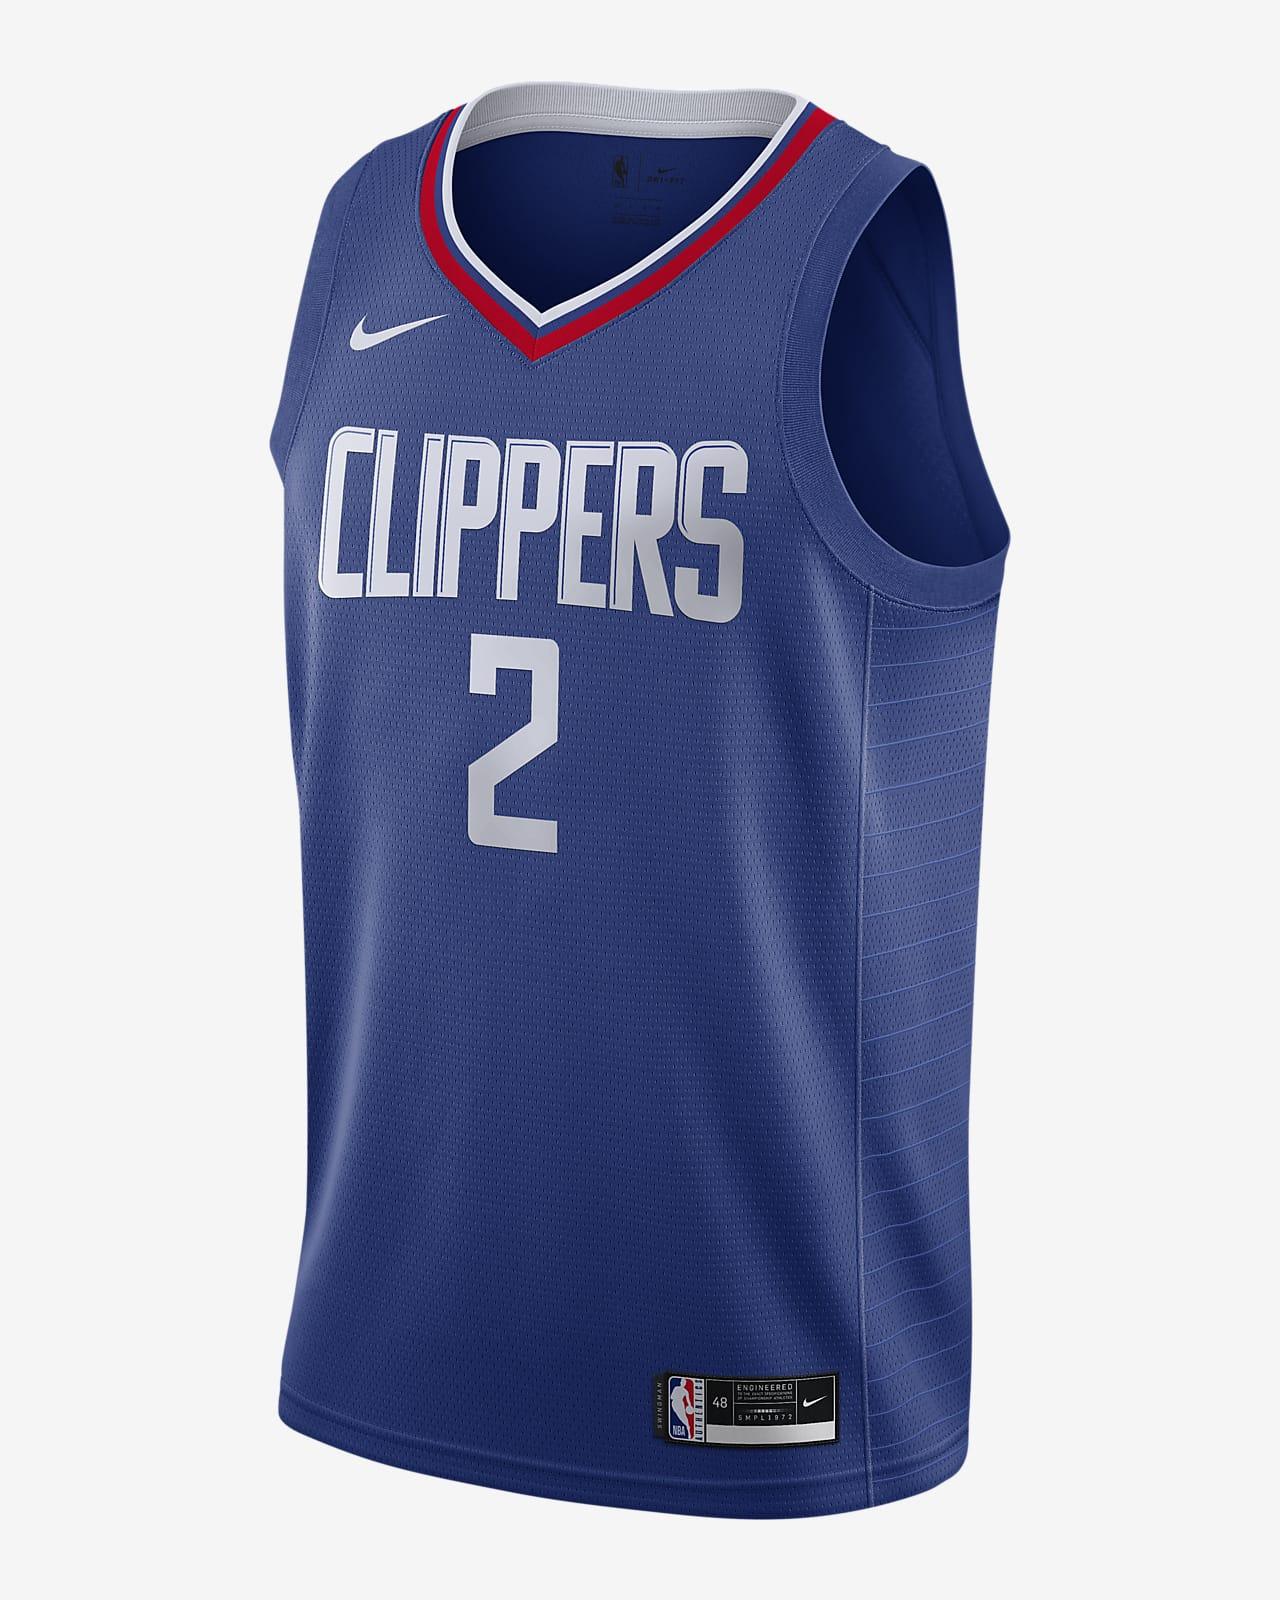 Kawhi Leonard Clippers Icon Edition 2020 Nike NBA Swingman Trikot